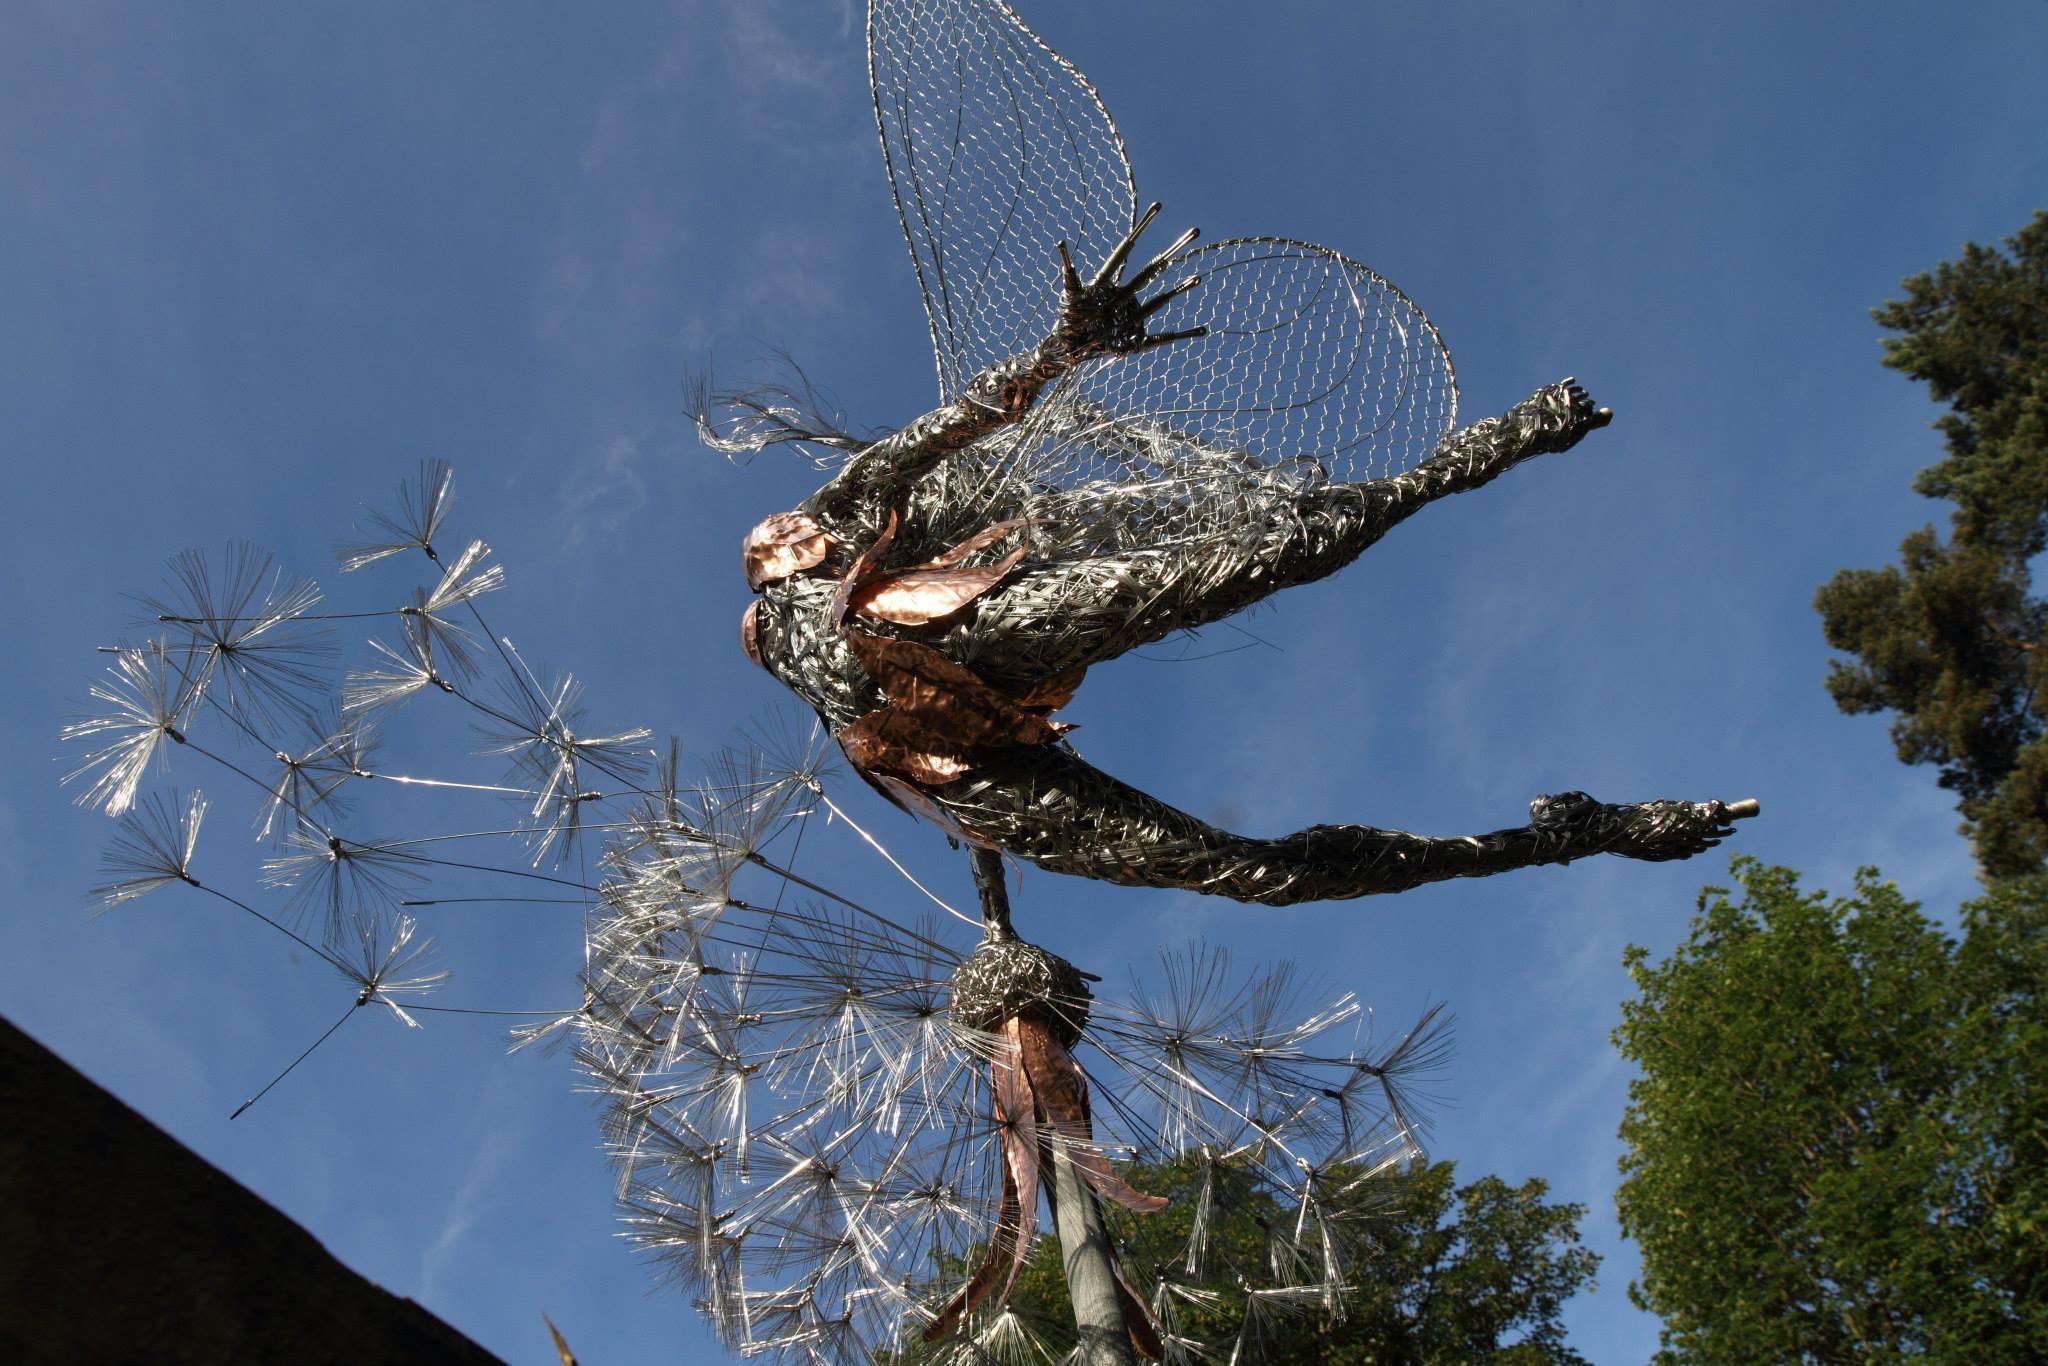 esculturas-fantasticas-de-robin-wight-09